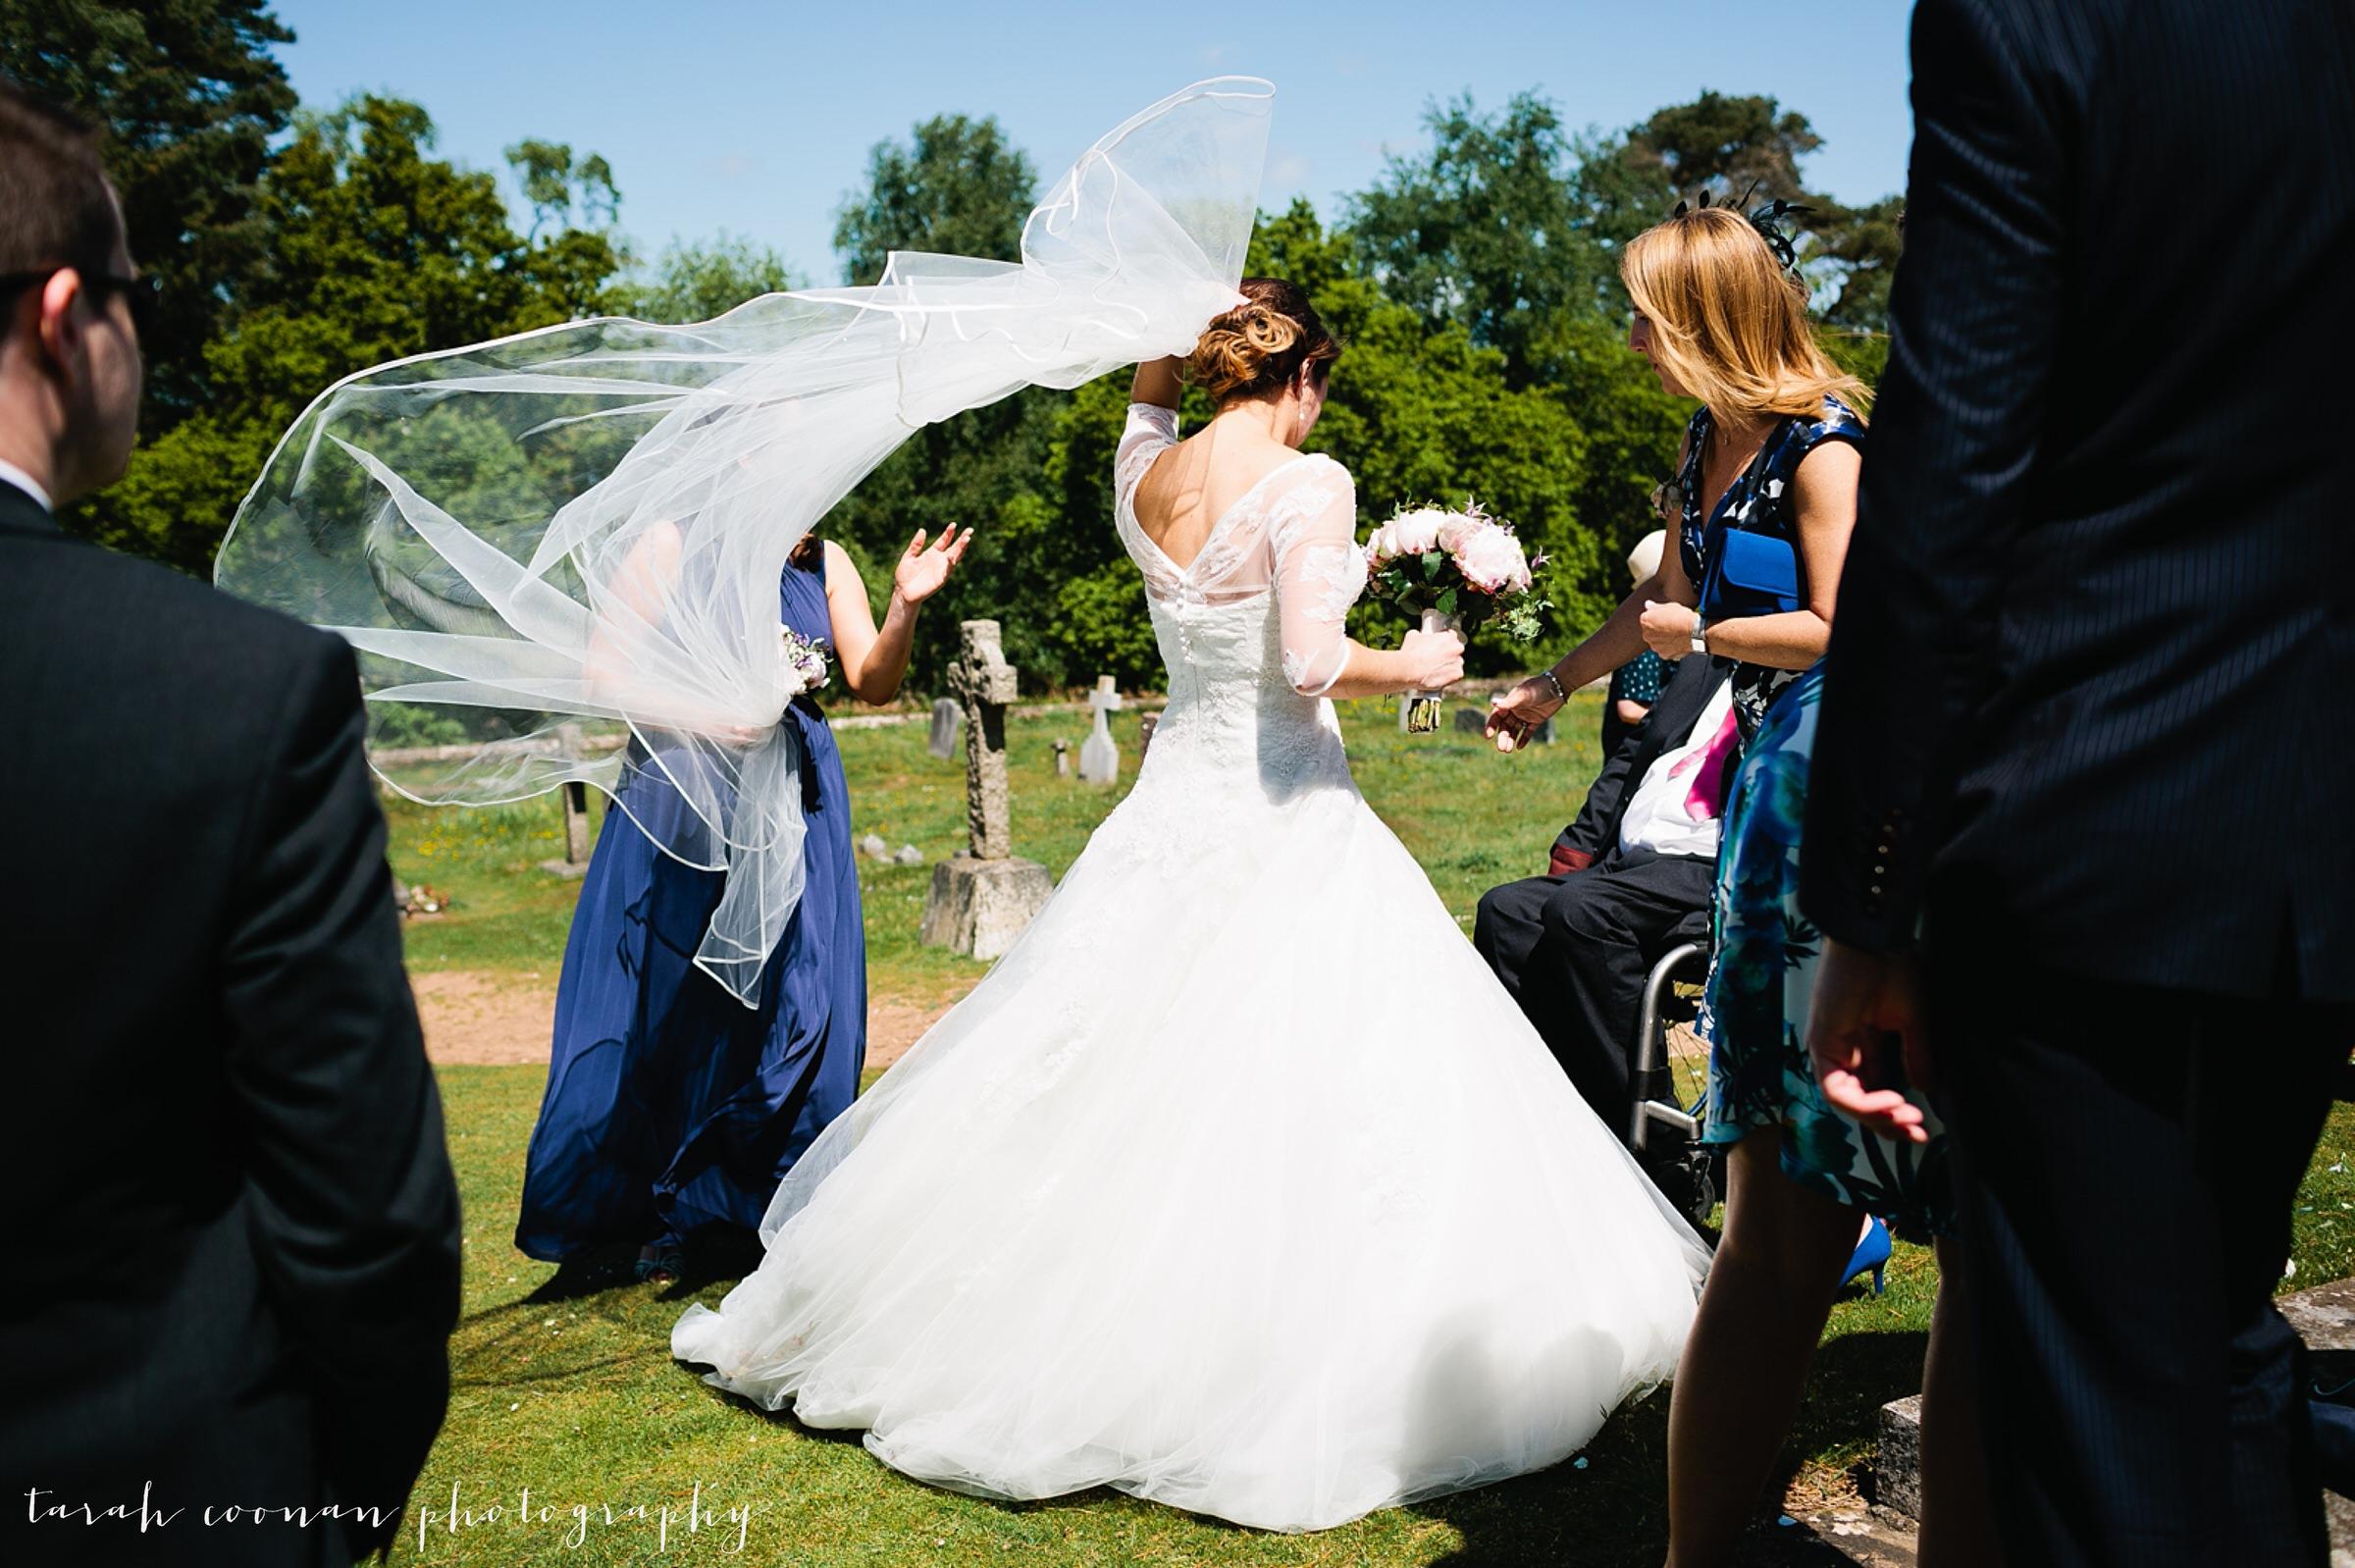 northbrook-park-wedding-photographer_045